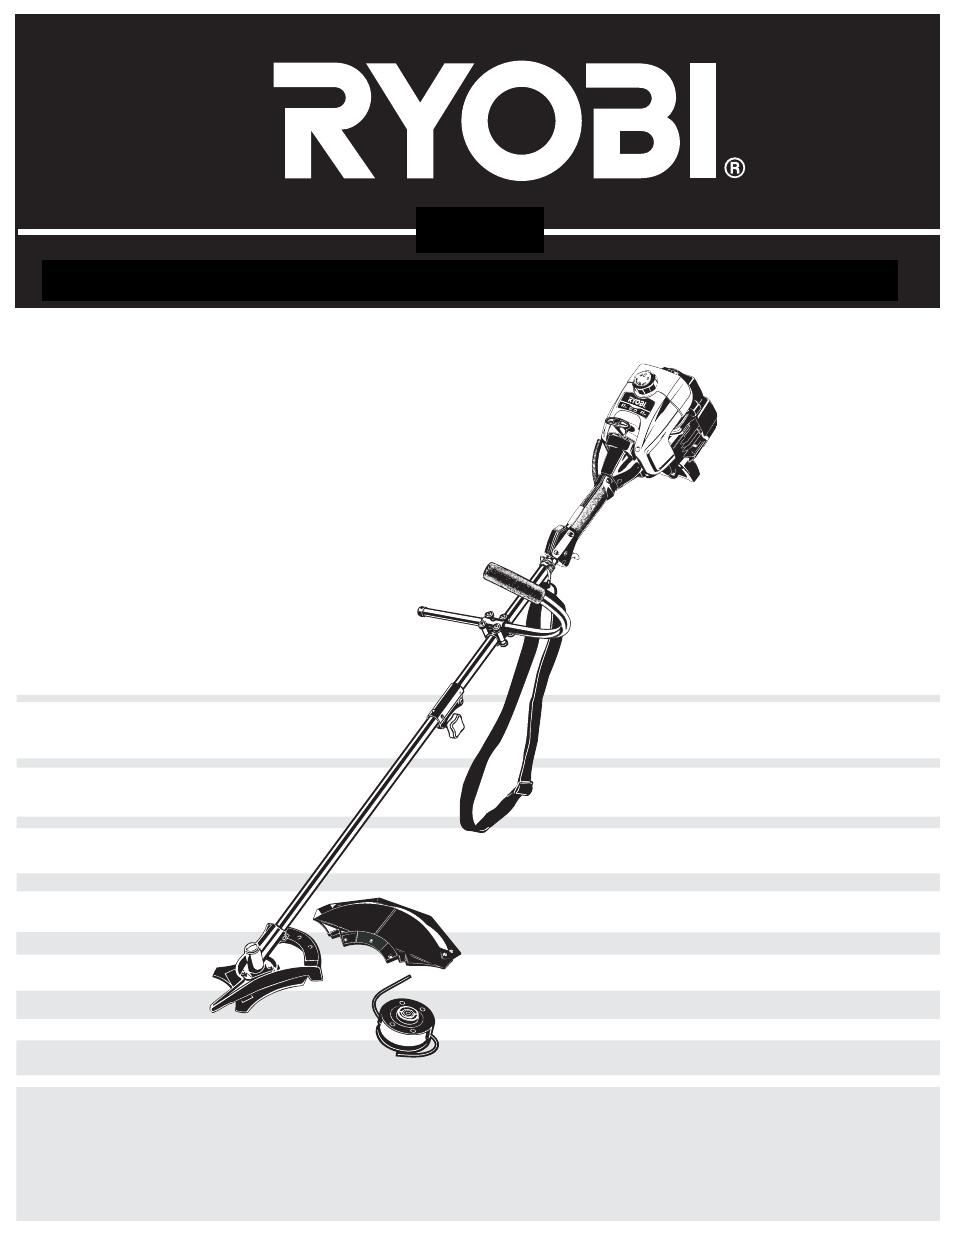 ryobi 780r manual how to and user guide instructions u2022 rh taxibermuda co ryobi 780r parts manual ryobi 780r manual pdf